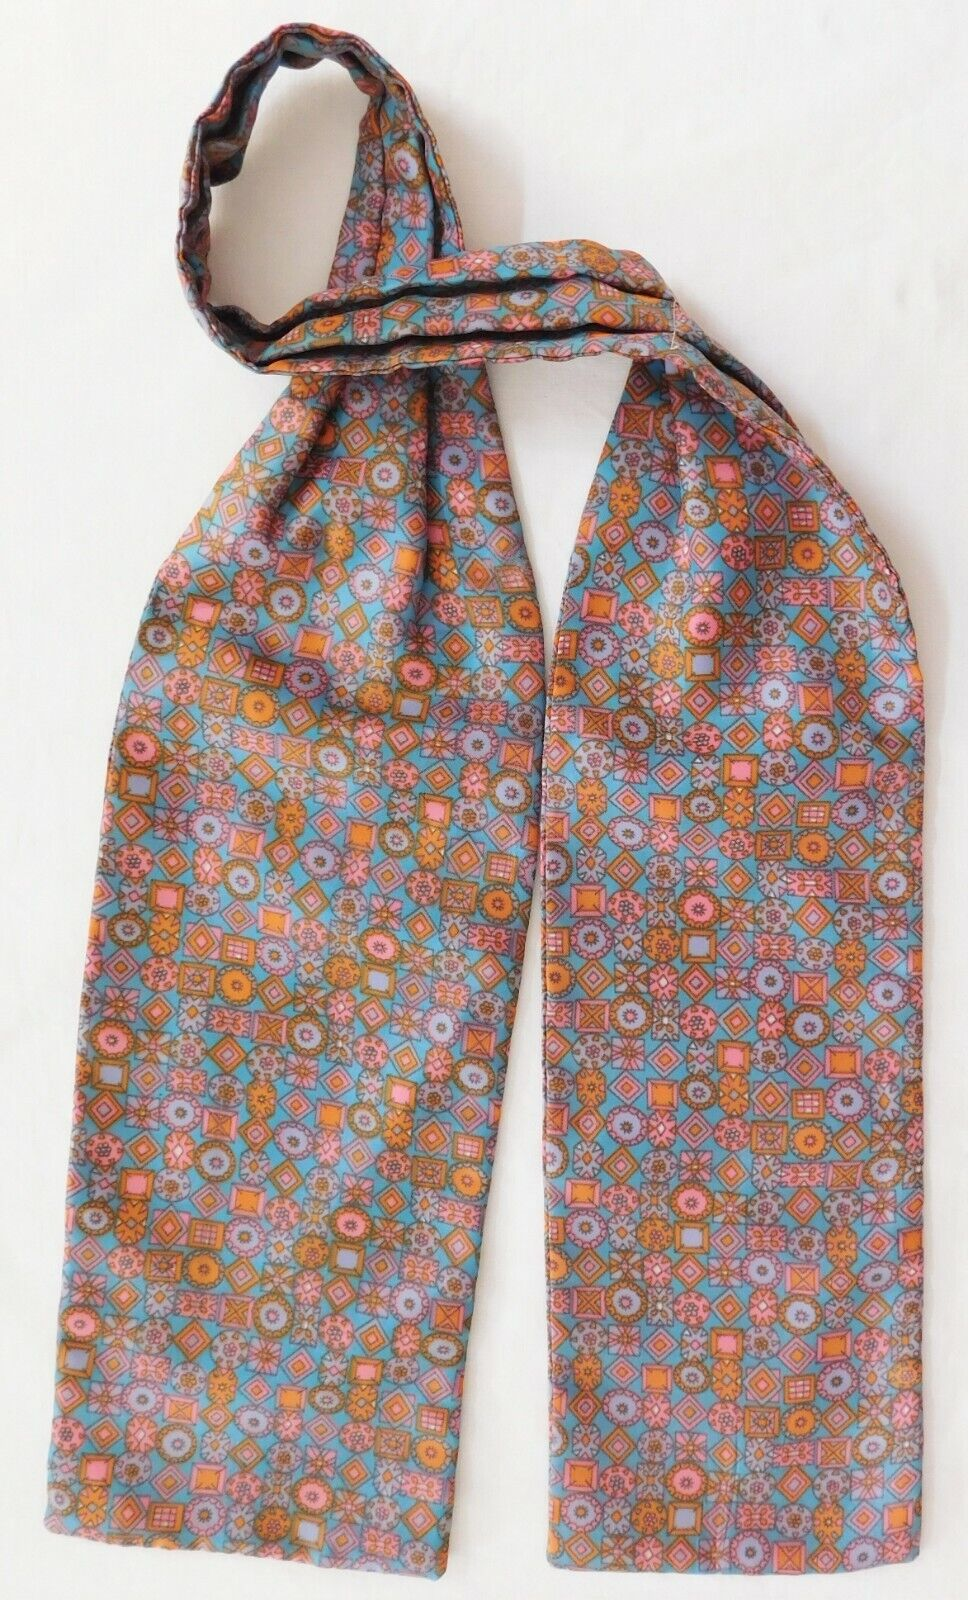 Smooth satin cravat with geometric pattern vintage 1960s menswear pastel colours